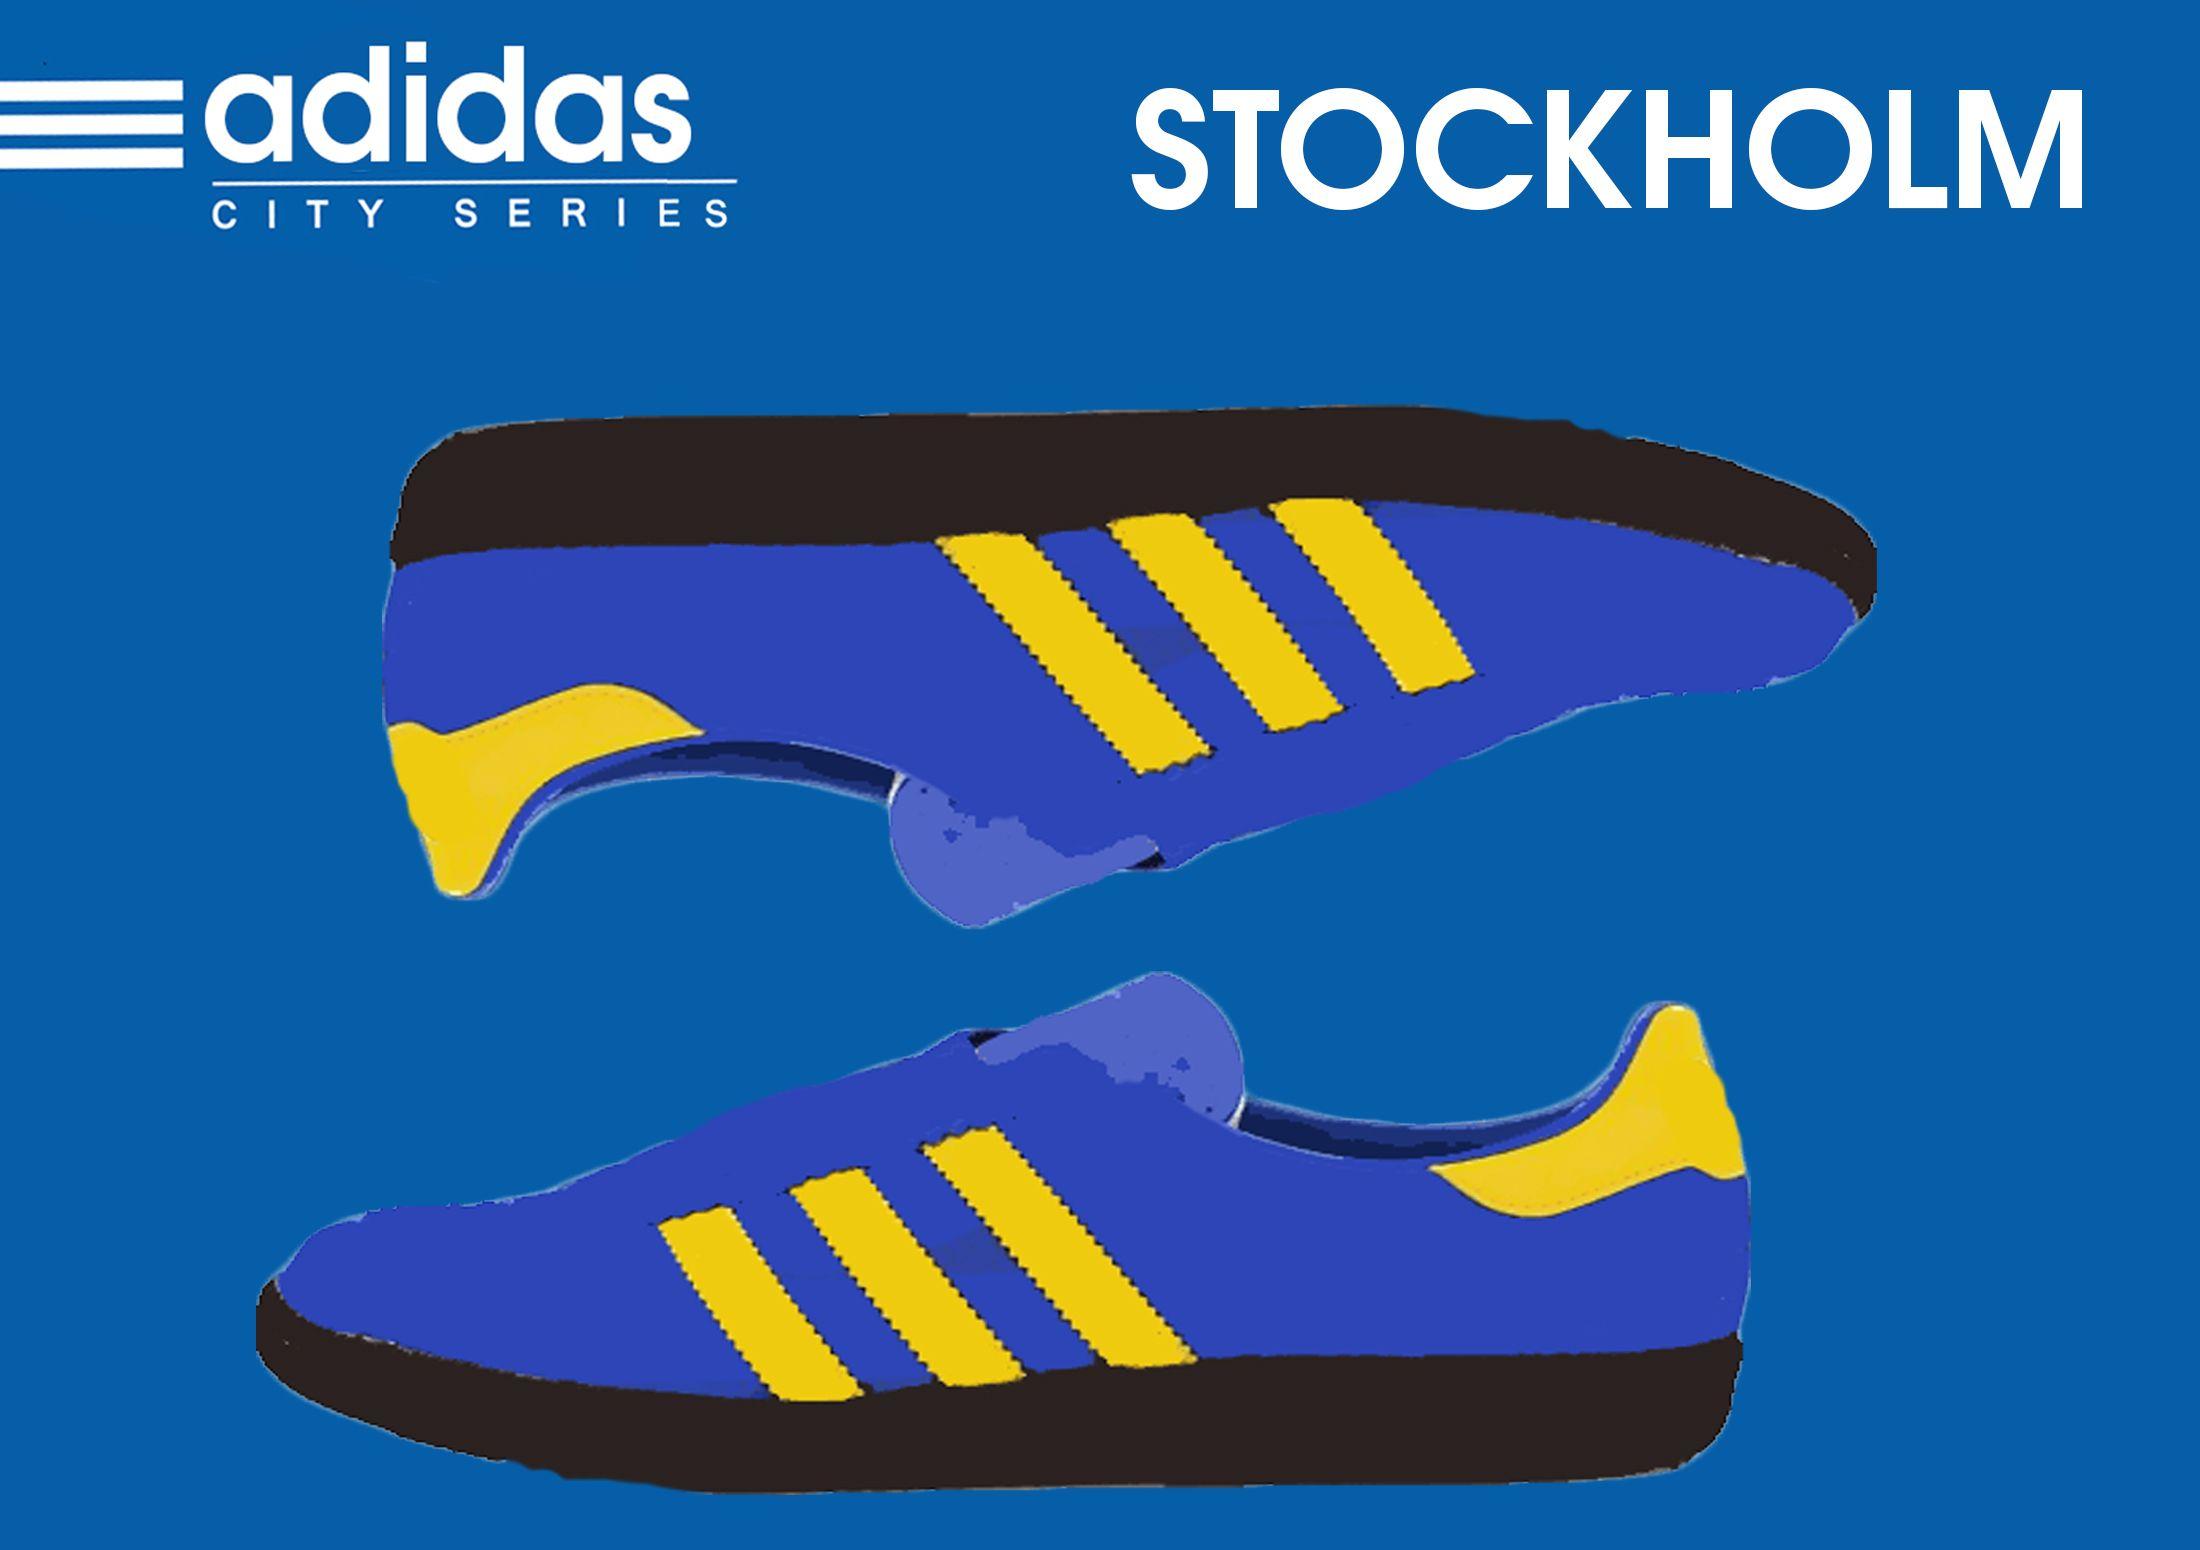 Adidas x Size? 2014 City Series Stockholm | Adidas di 2019